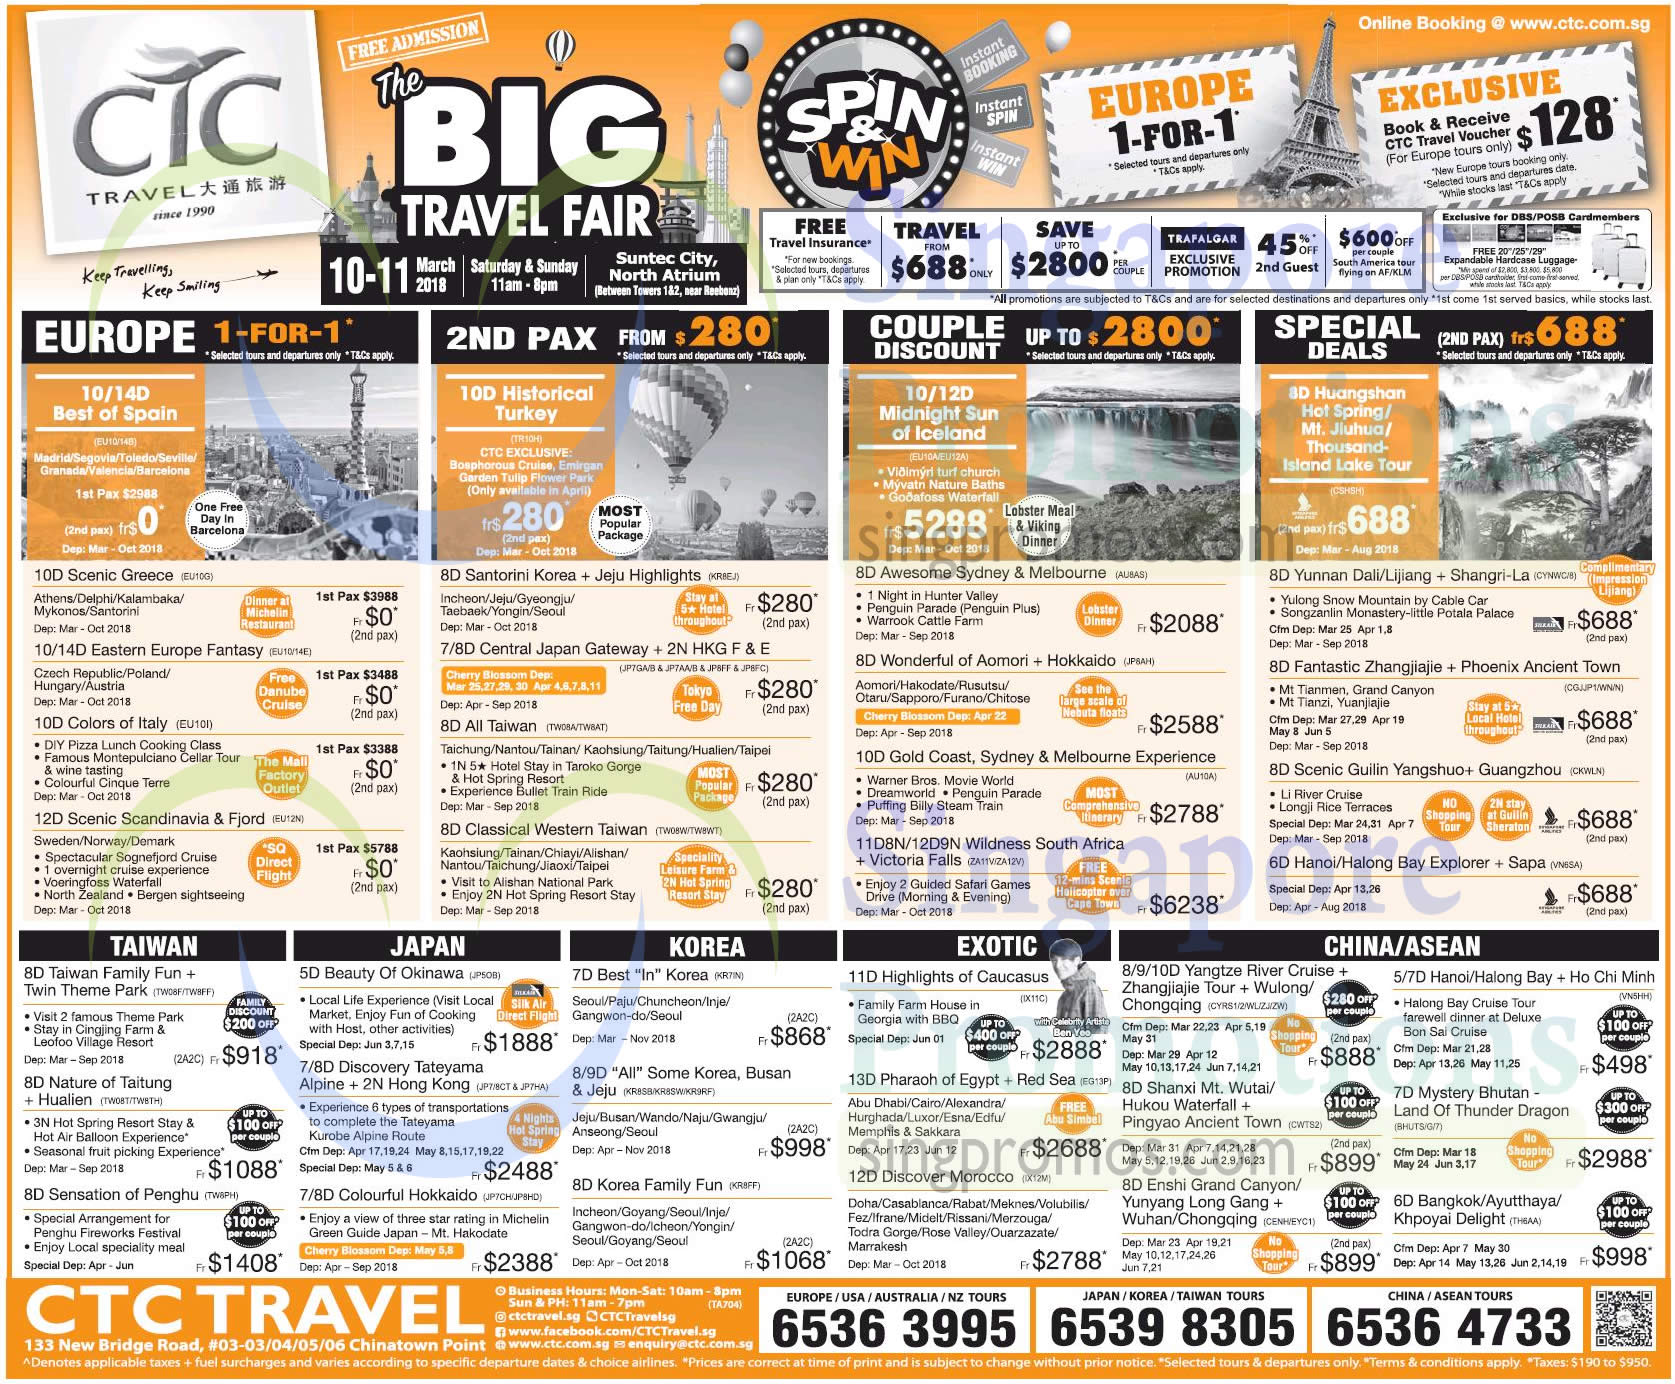 Ctc Annual Travel Insurance